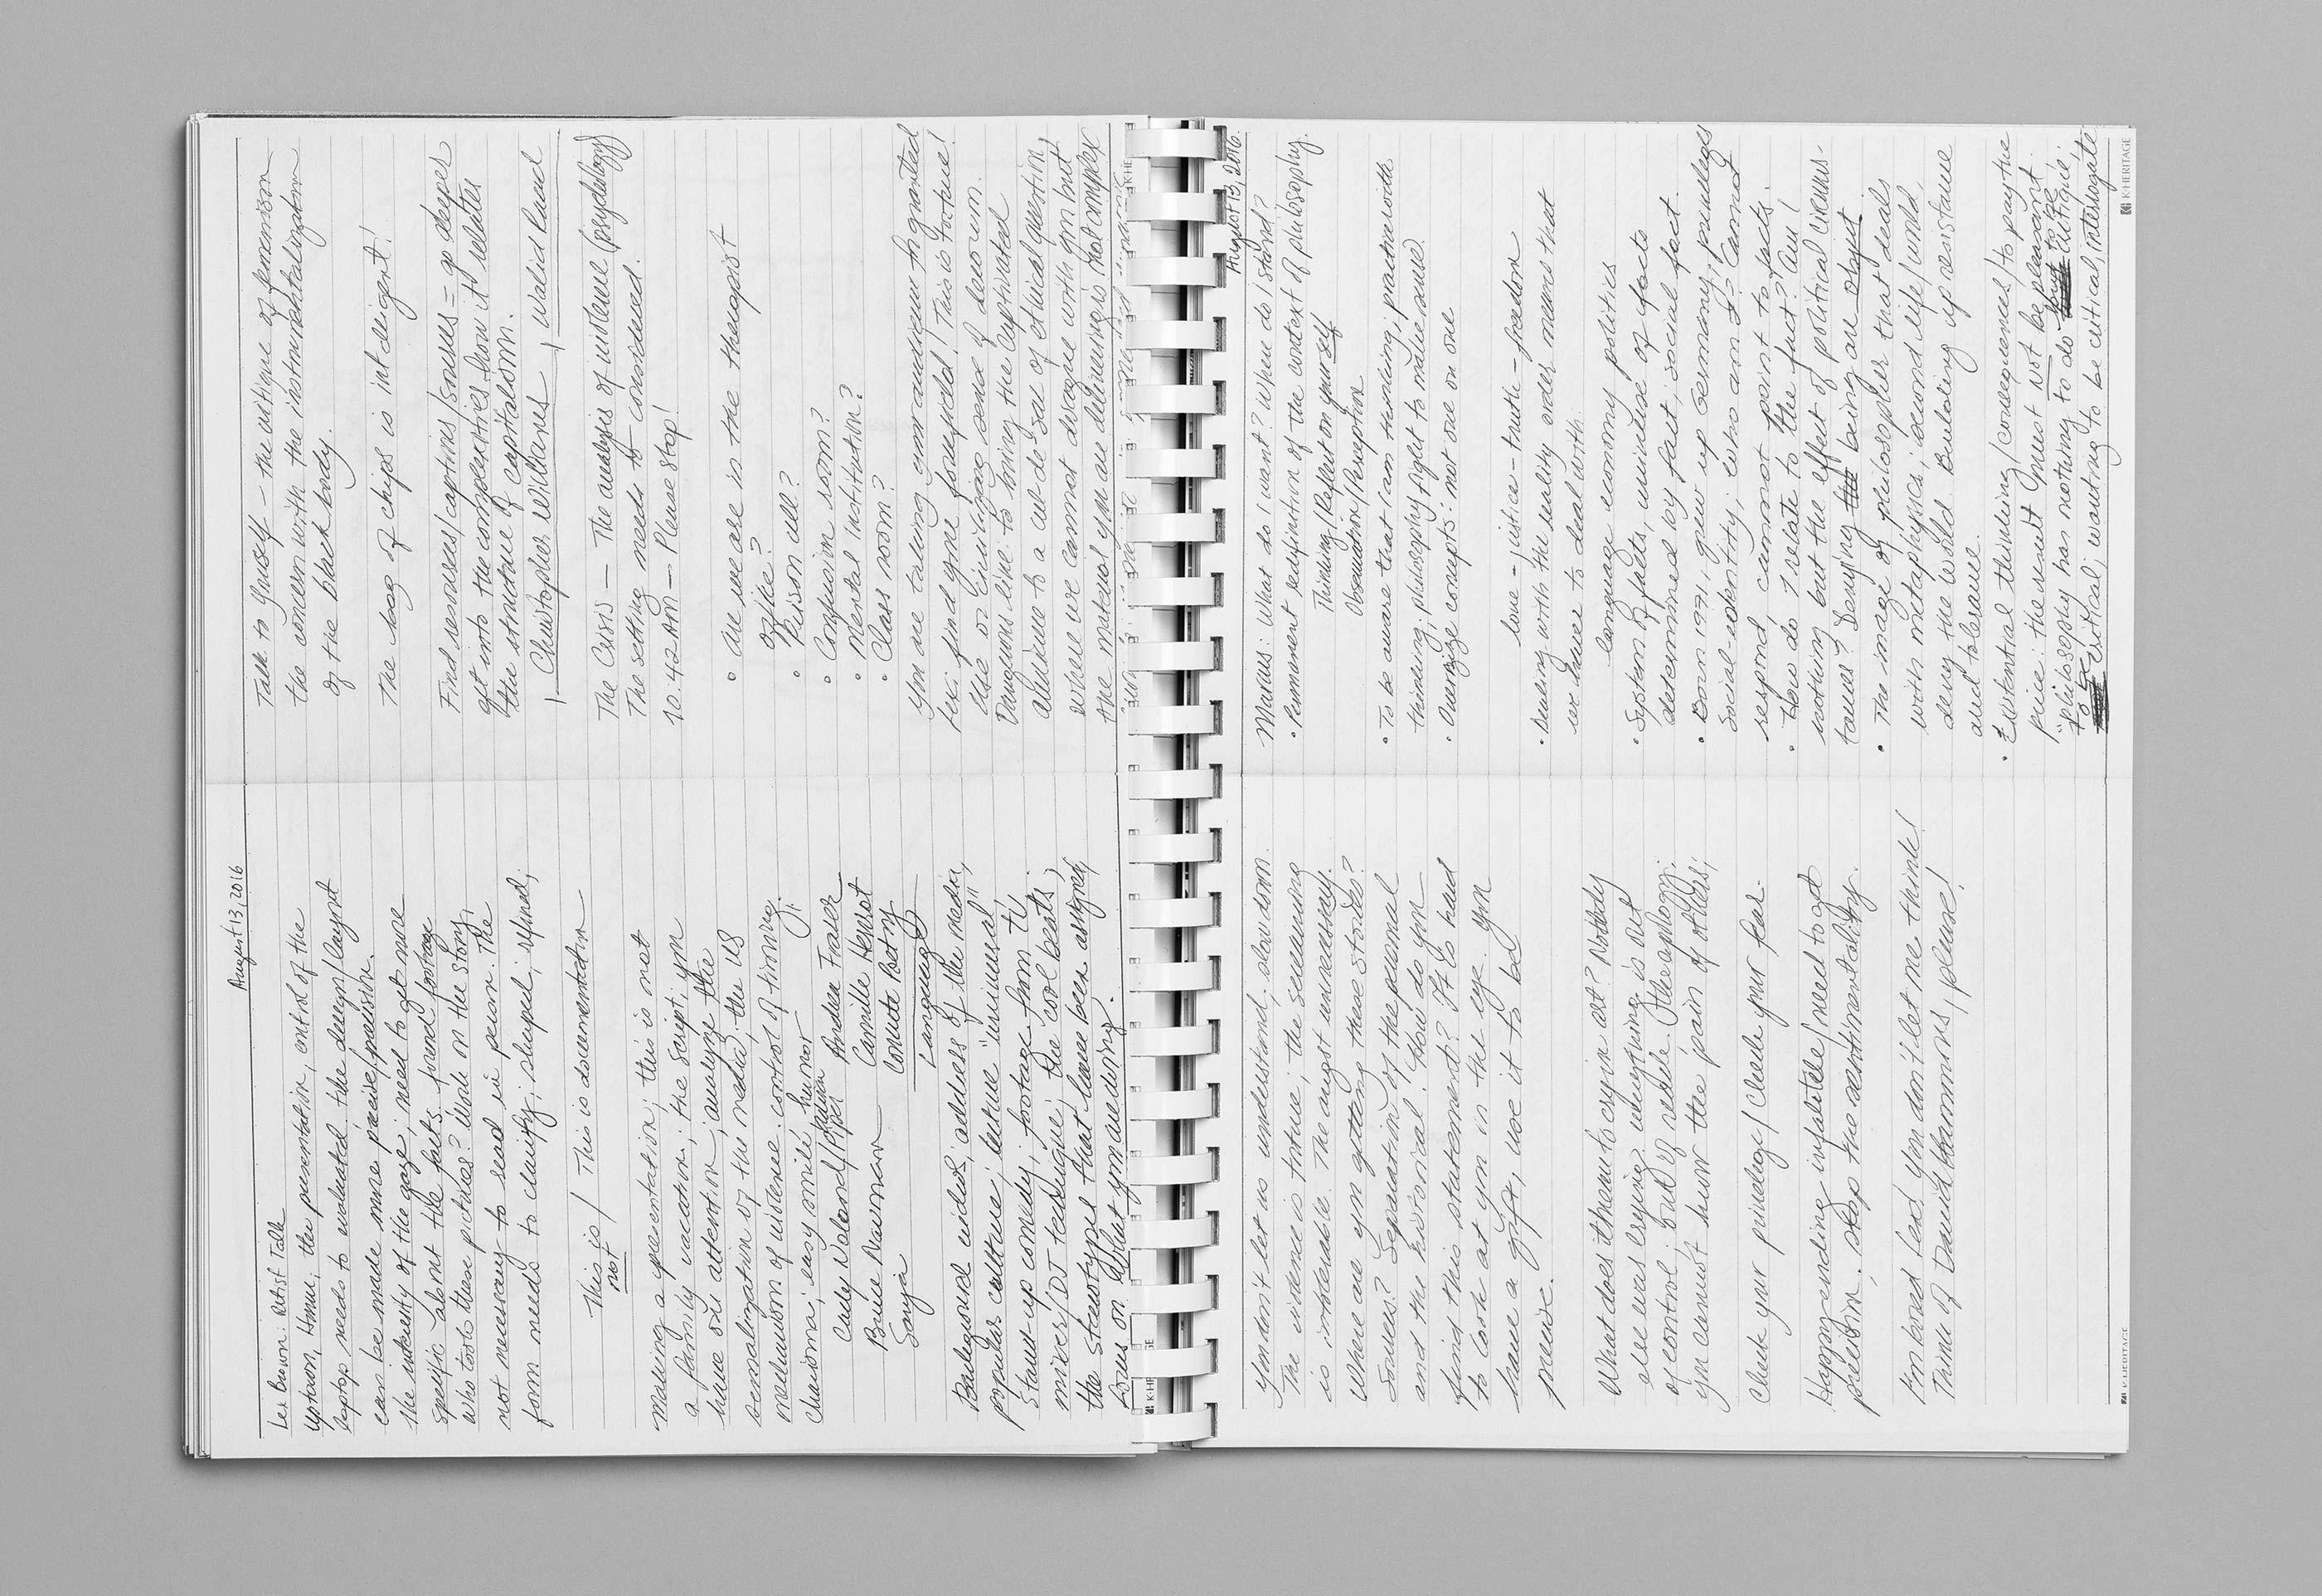 Sommerakademie im Zentrum Paul Klee 2016 – Publikation Thomas Hirschhorn, 12  ©Atelier Pol